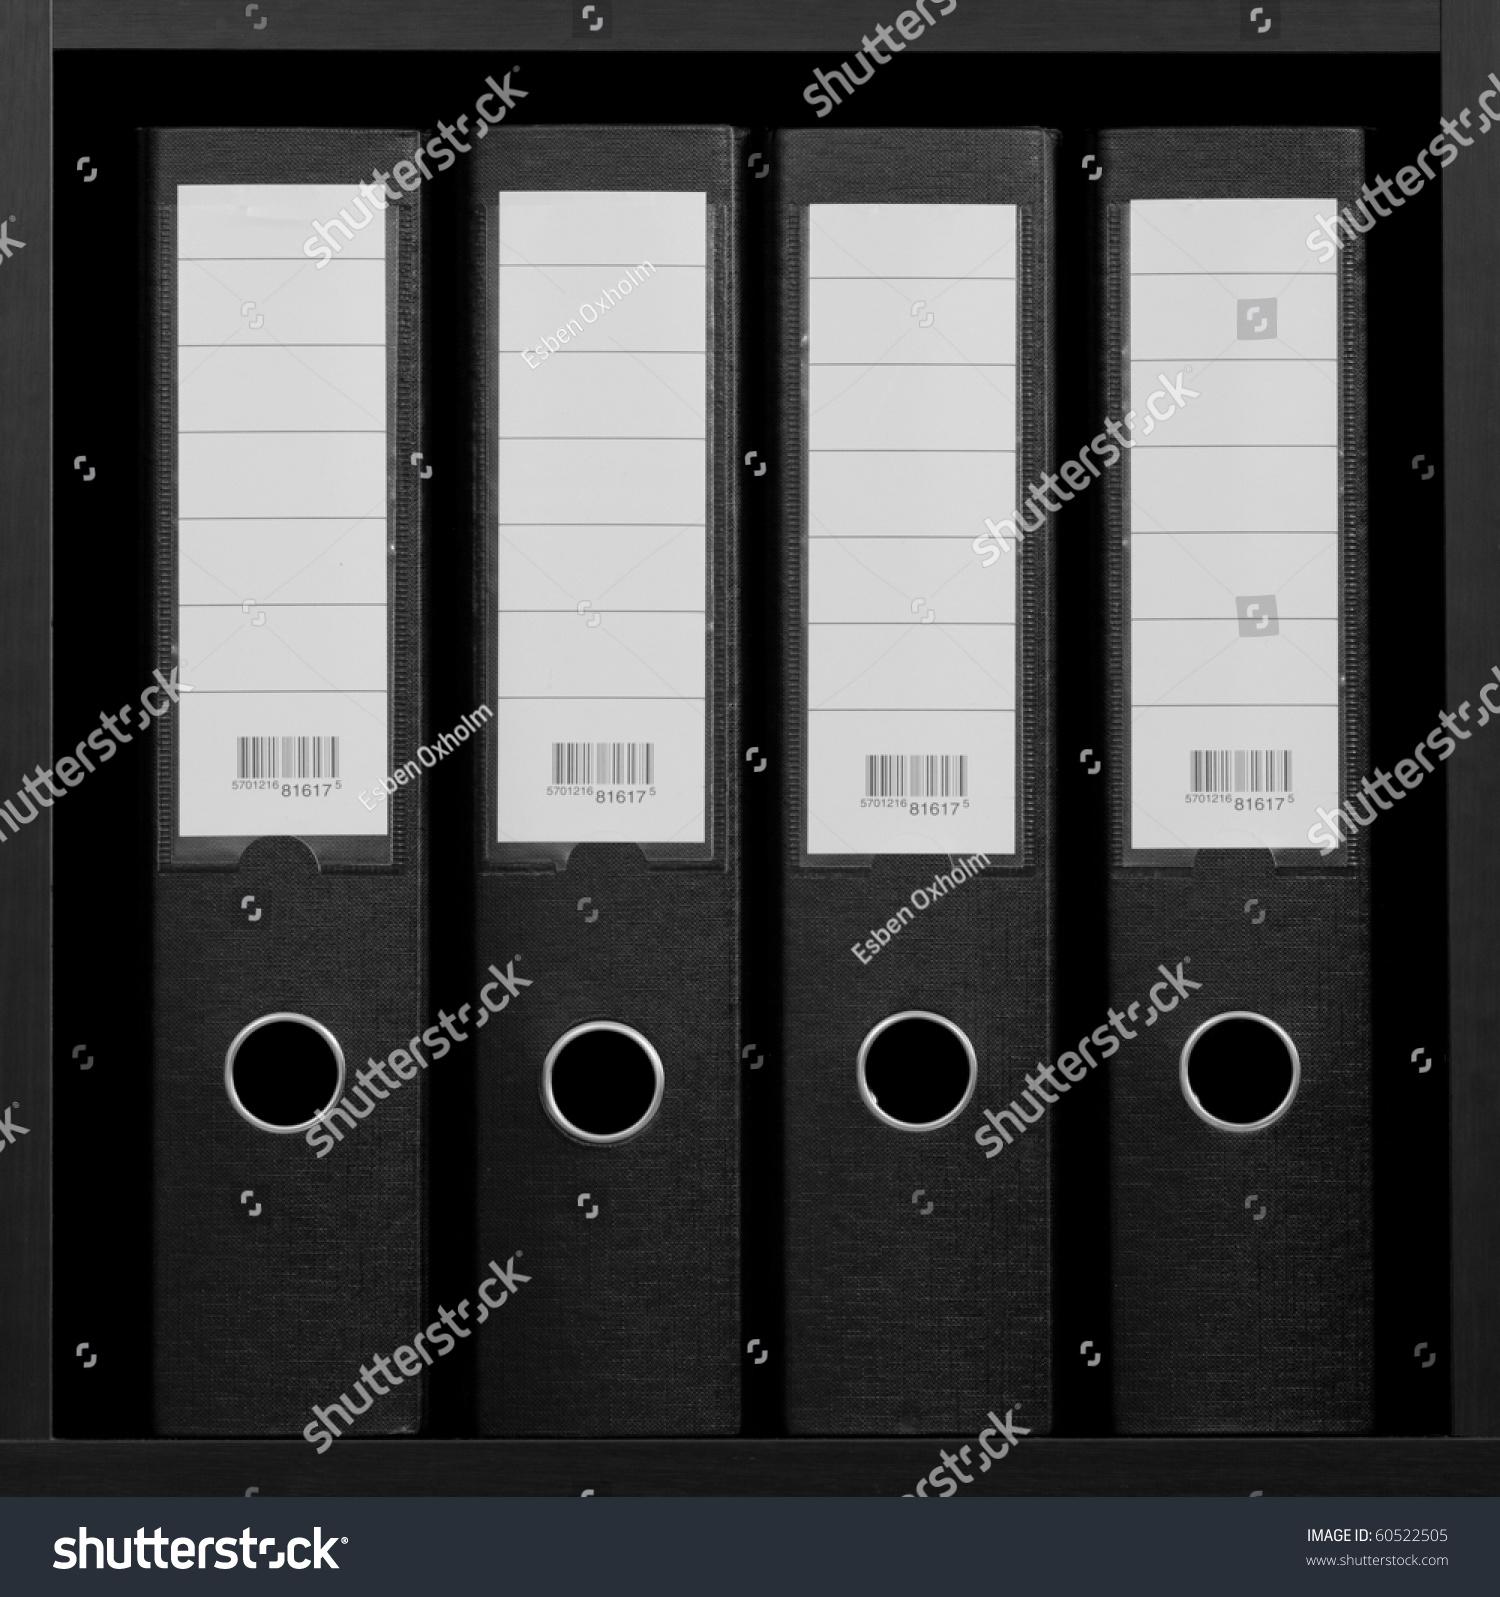 four binder - Paso.evolist.co